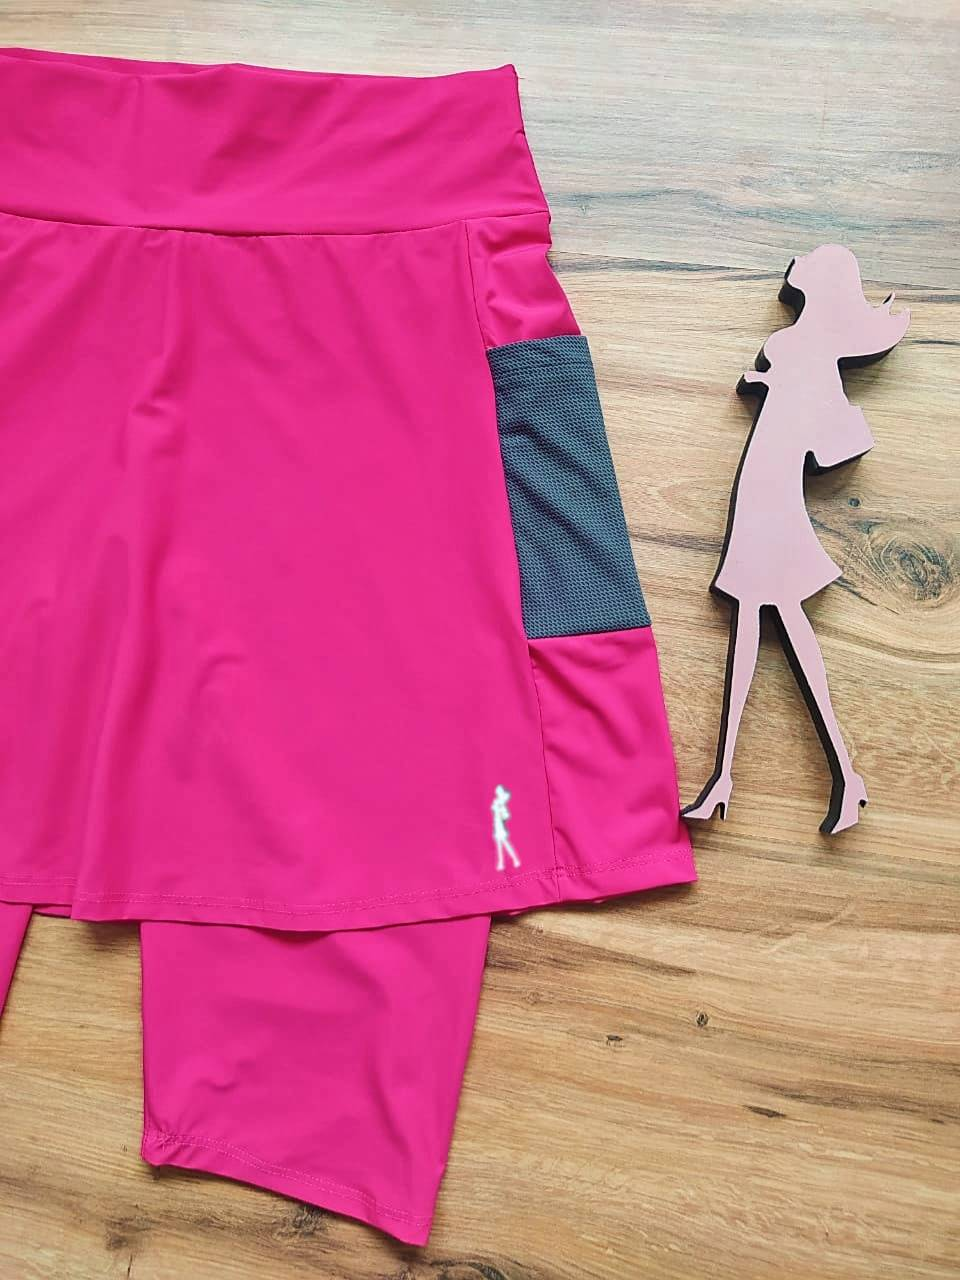 Saia Bermuda Nina - Esporte Fitness Saia Bela - SBF004 - Pink e Cinza